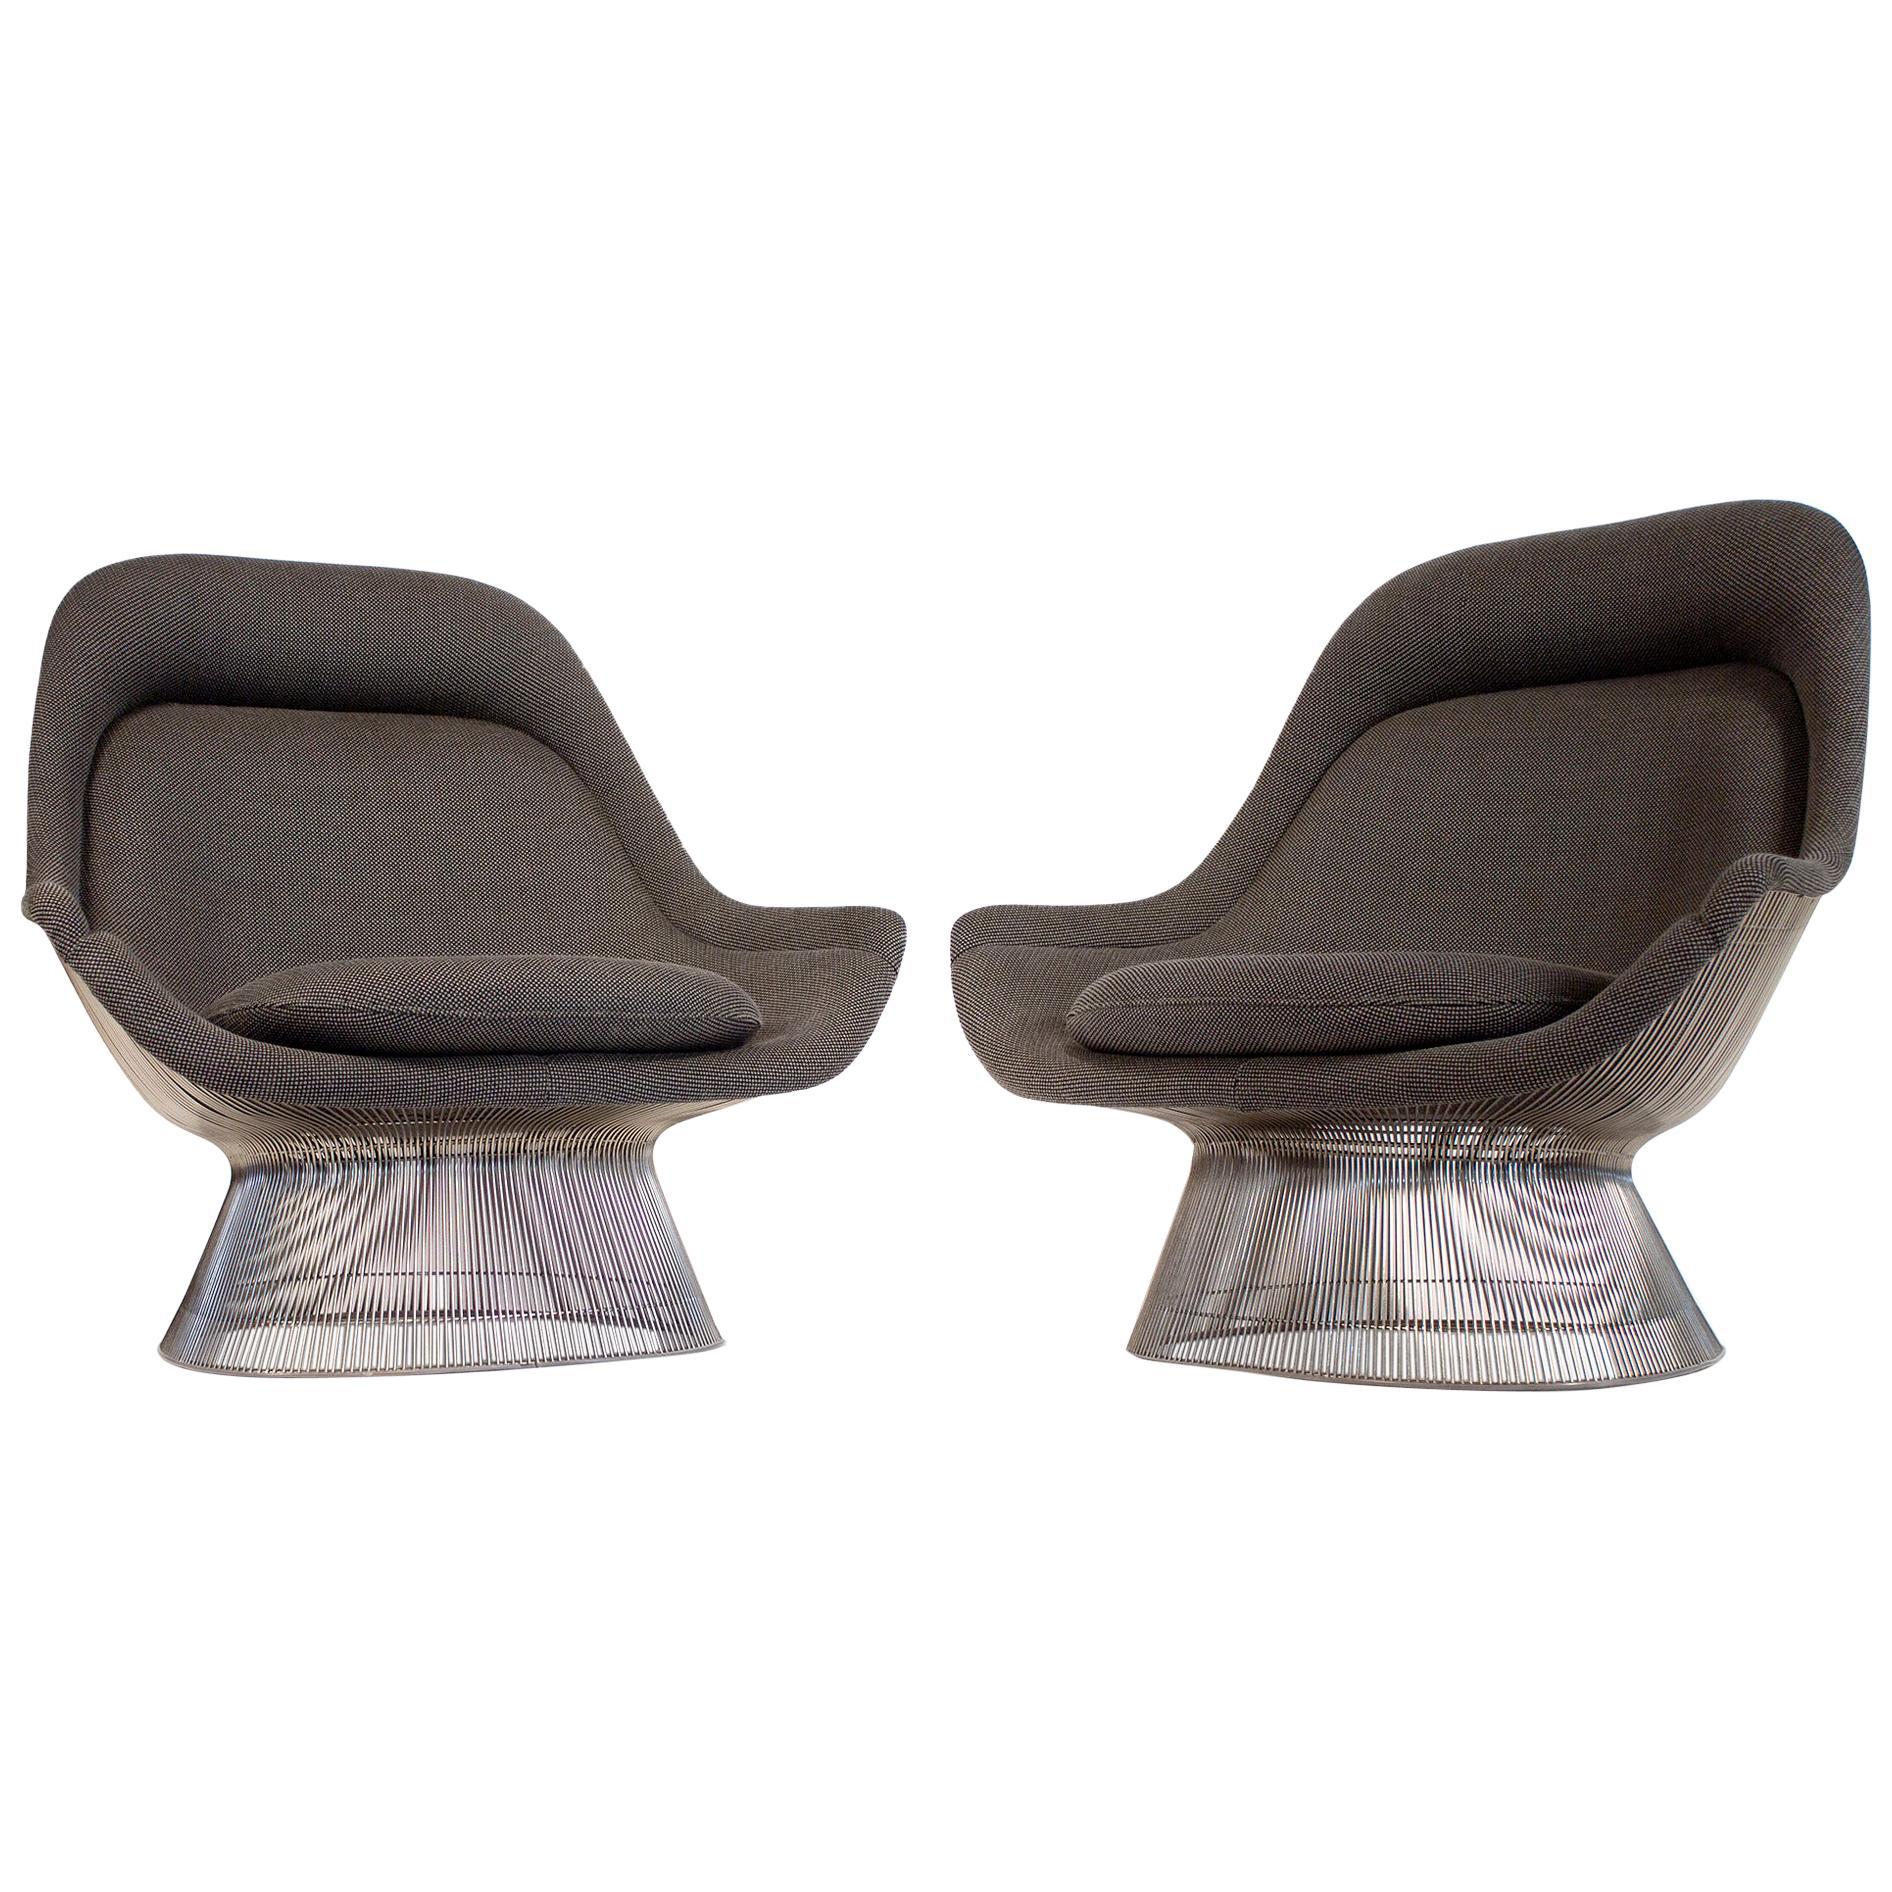 Warren Platner Easy Chair for Knoll in Original Wool High Back Lounge, 1970s